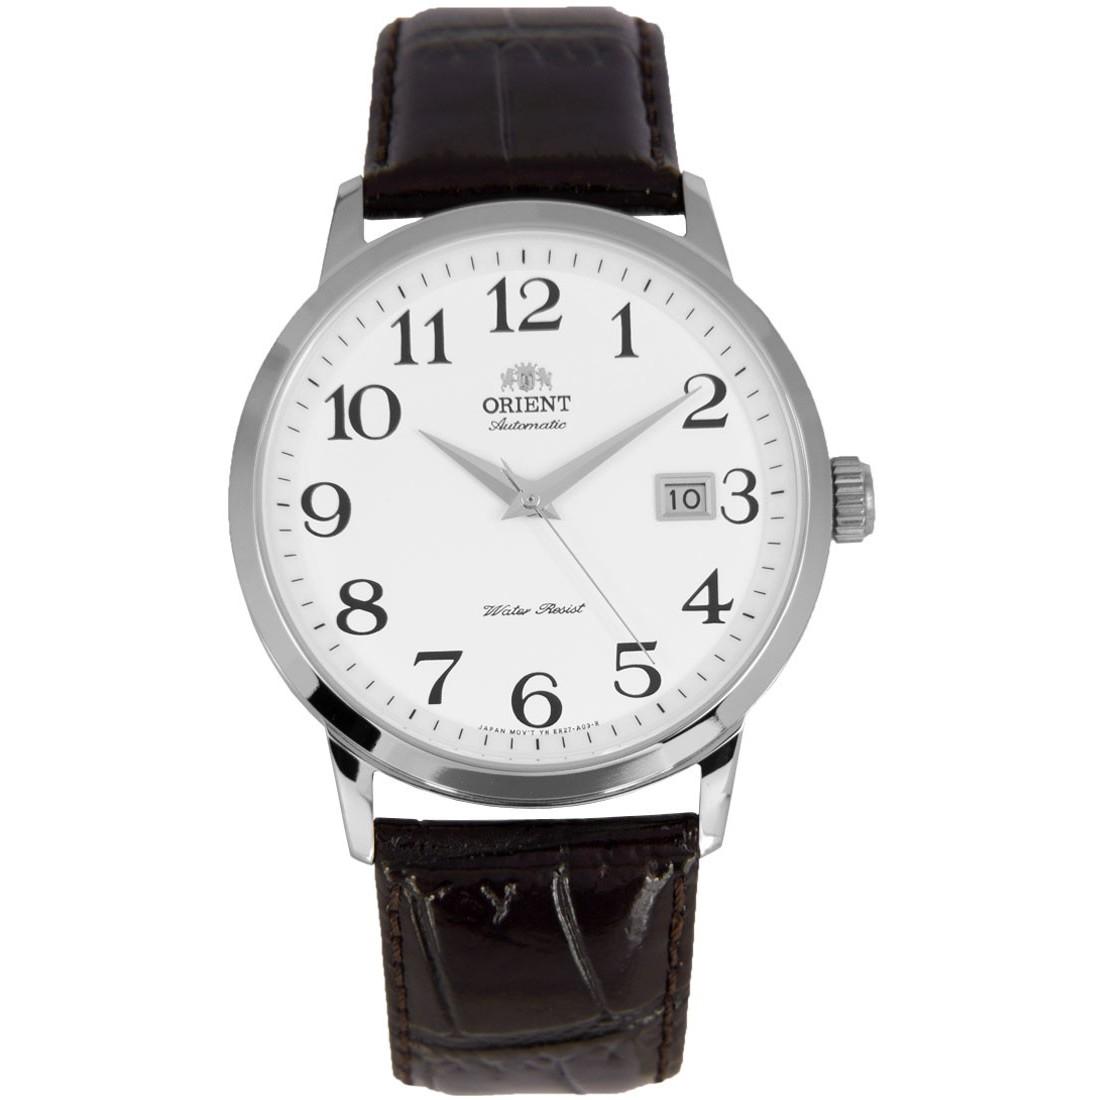 Ceas barbatesc Orient Classic Automatic FER27008W0 de mana original